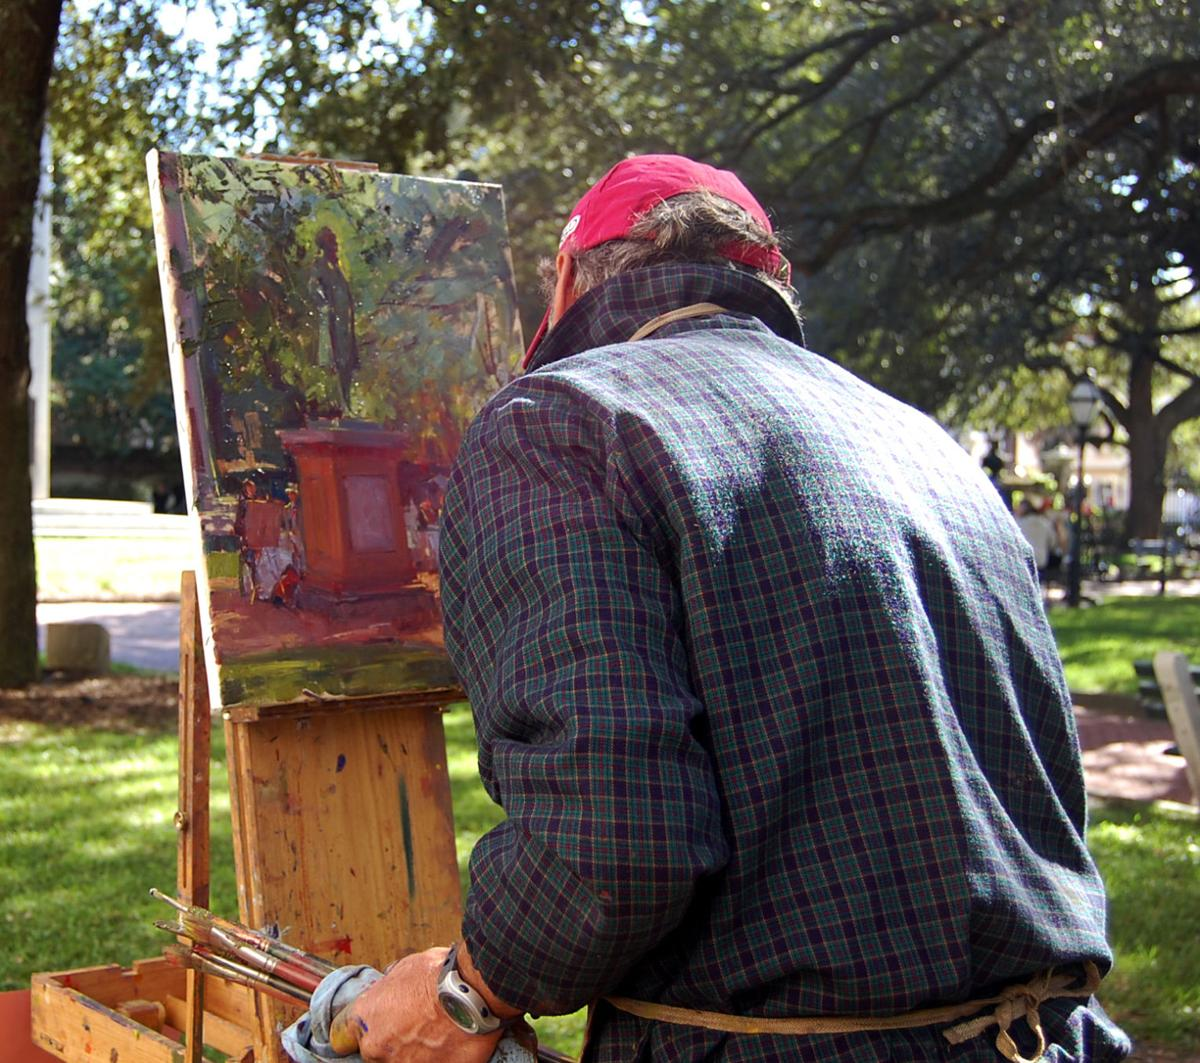 Charleston Fine Art Dealers' hold its Fine Art Annual